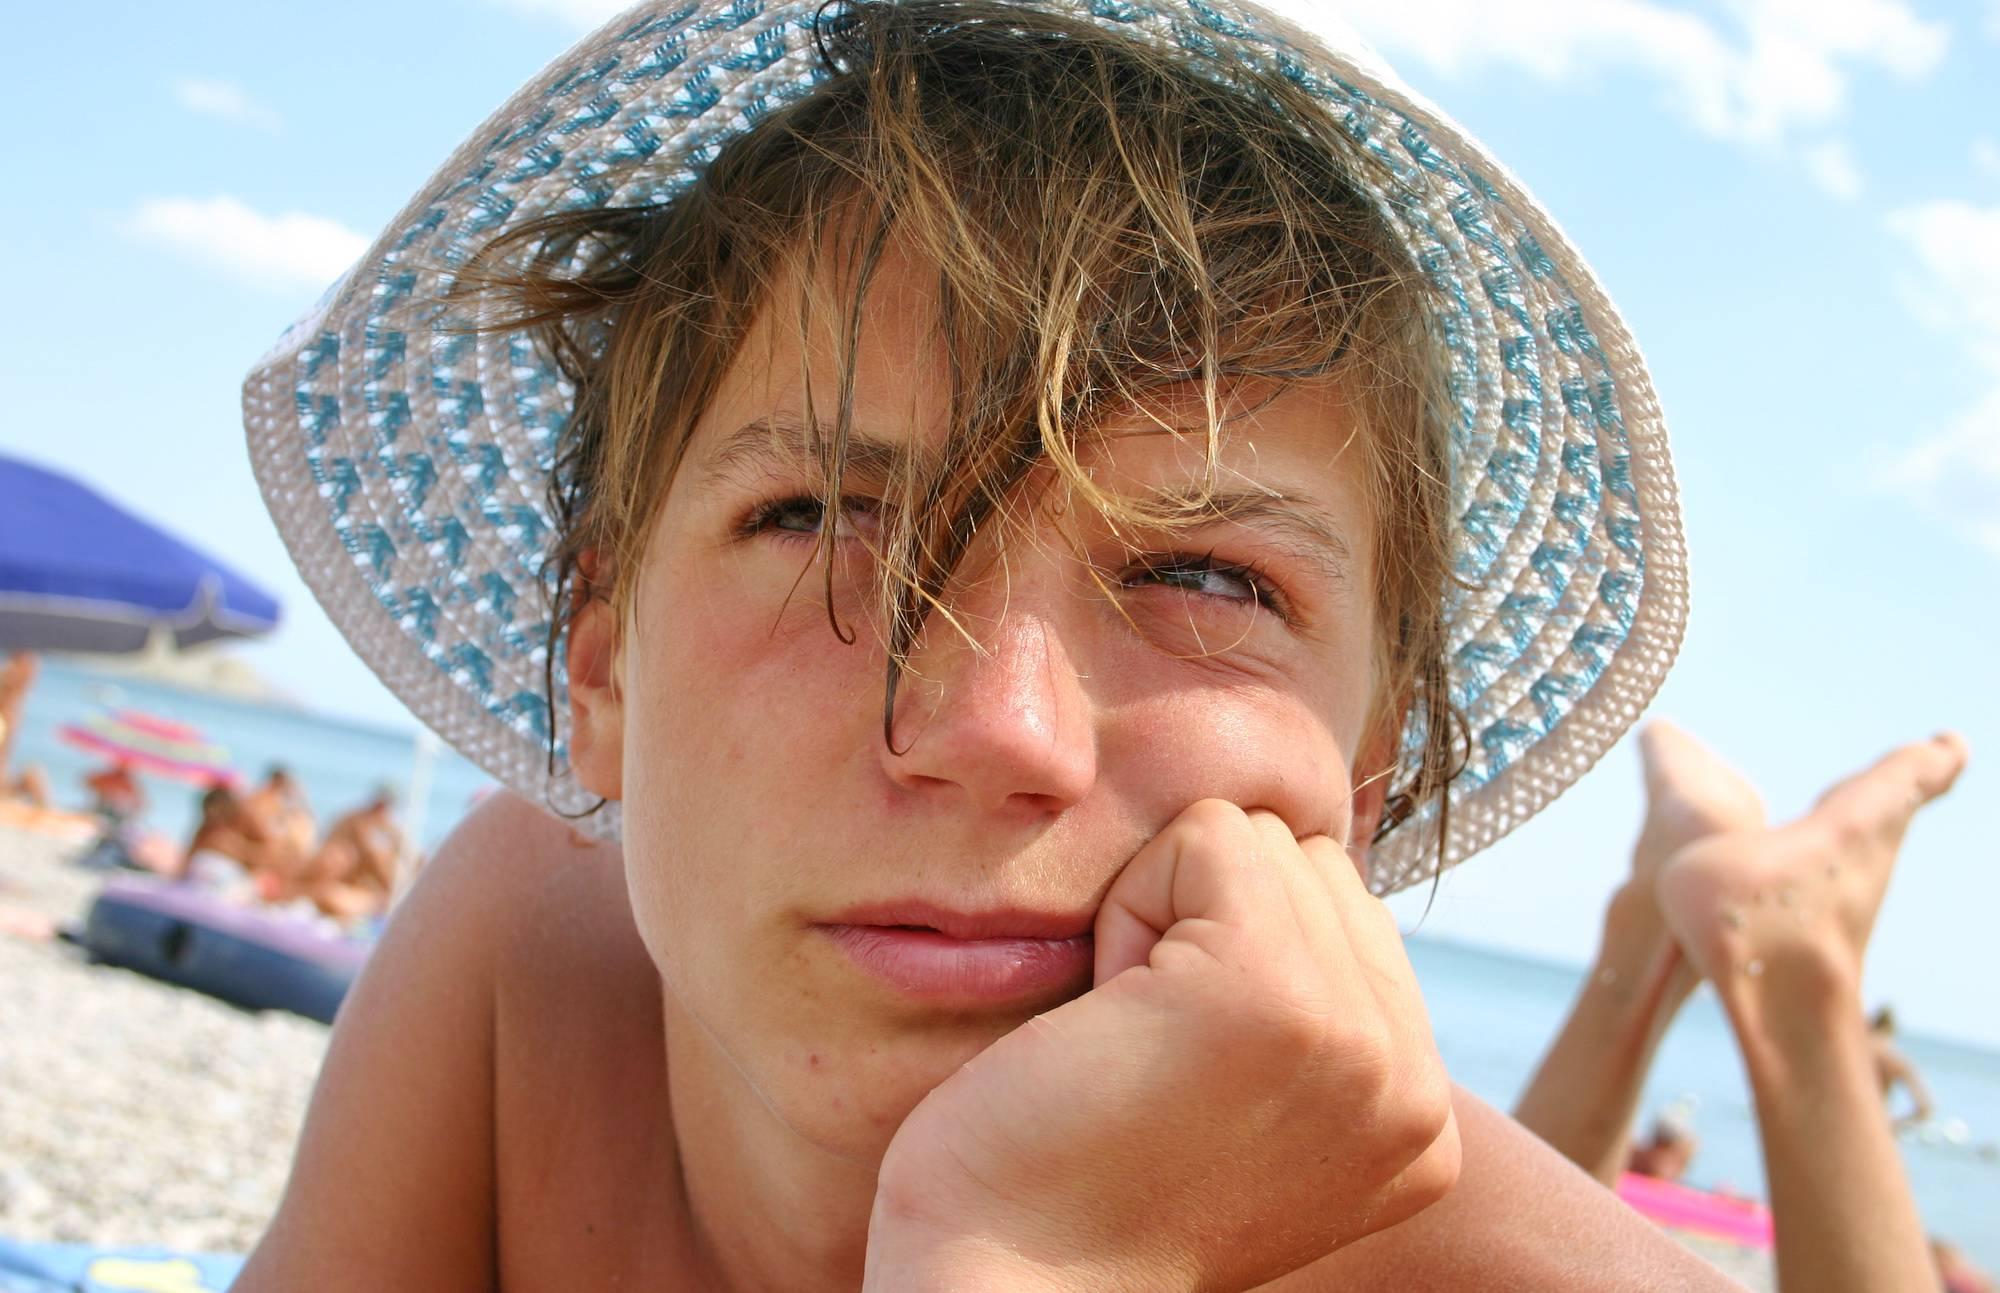 Sunshine Nude Hat Series - 1